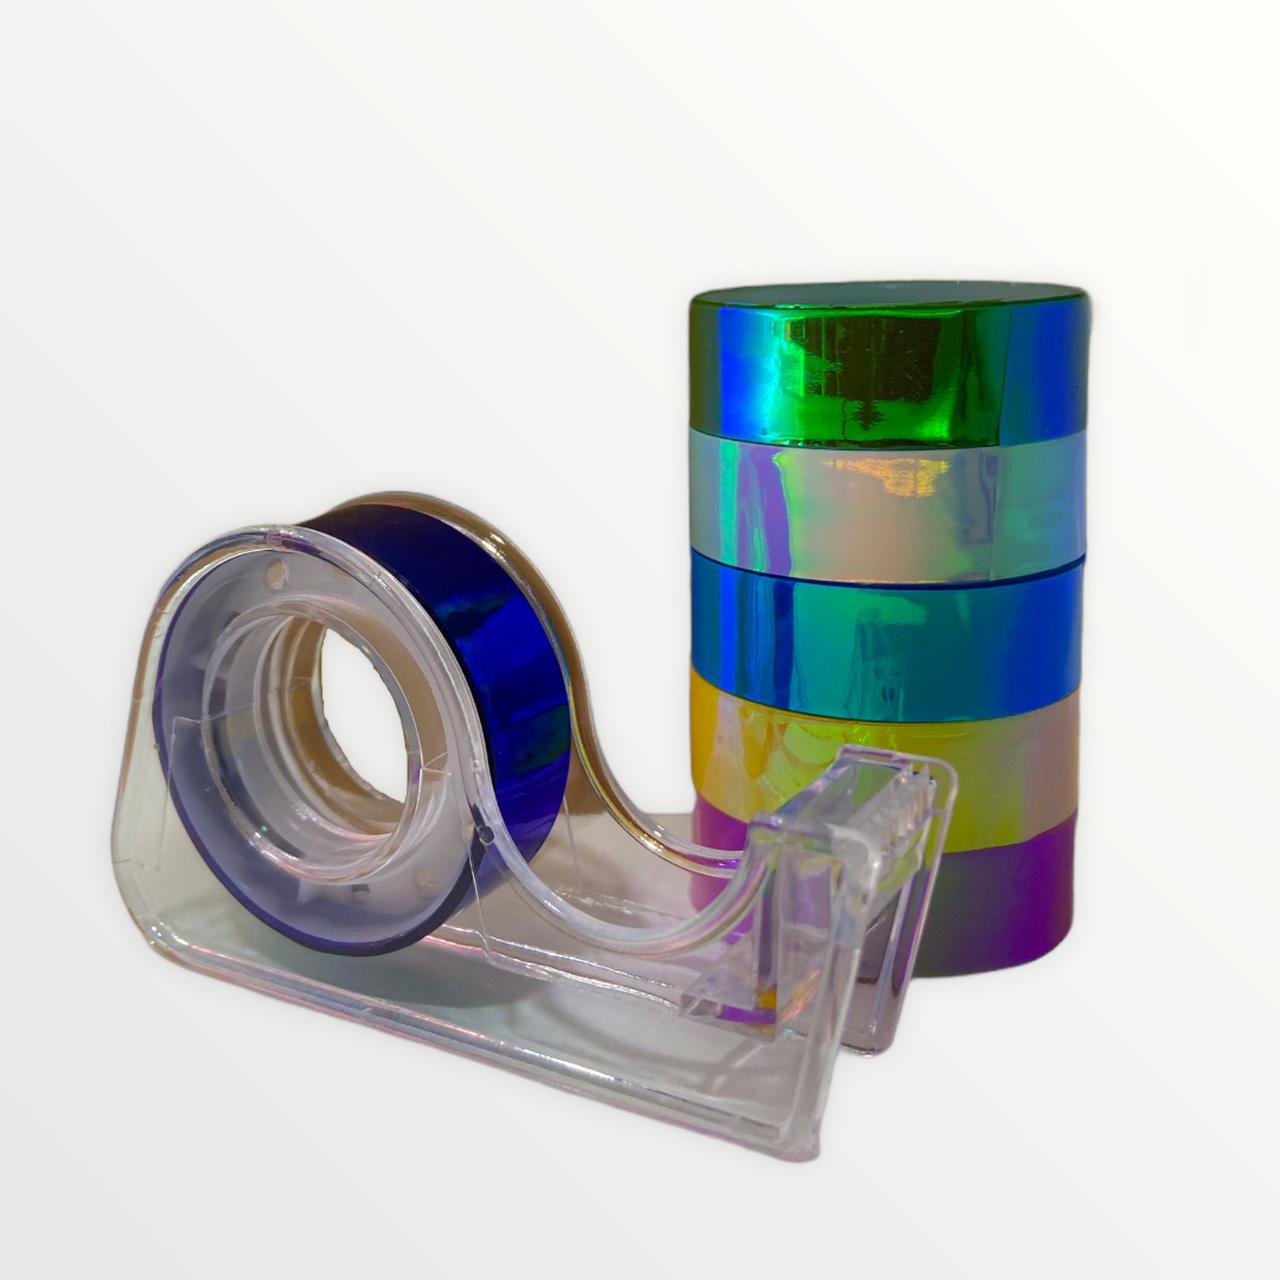 Kit com 6 Fitas Adesivas Metalizadas c/ Suporte Durex Moure Jar